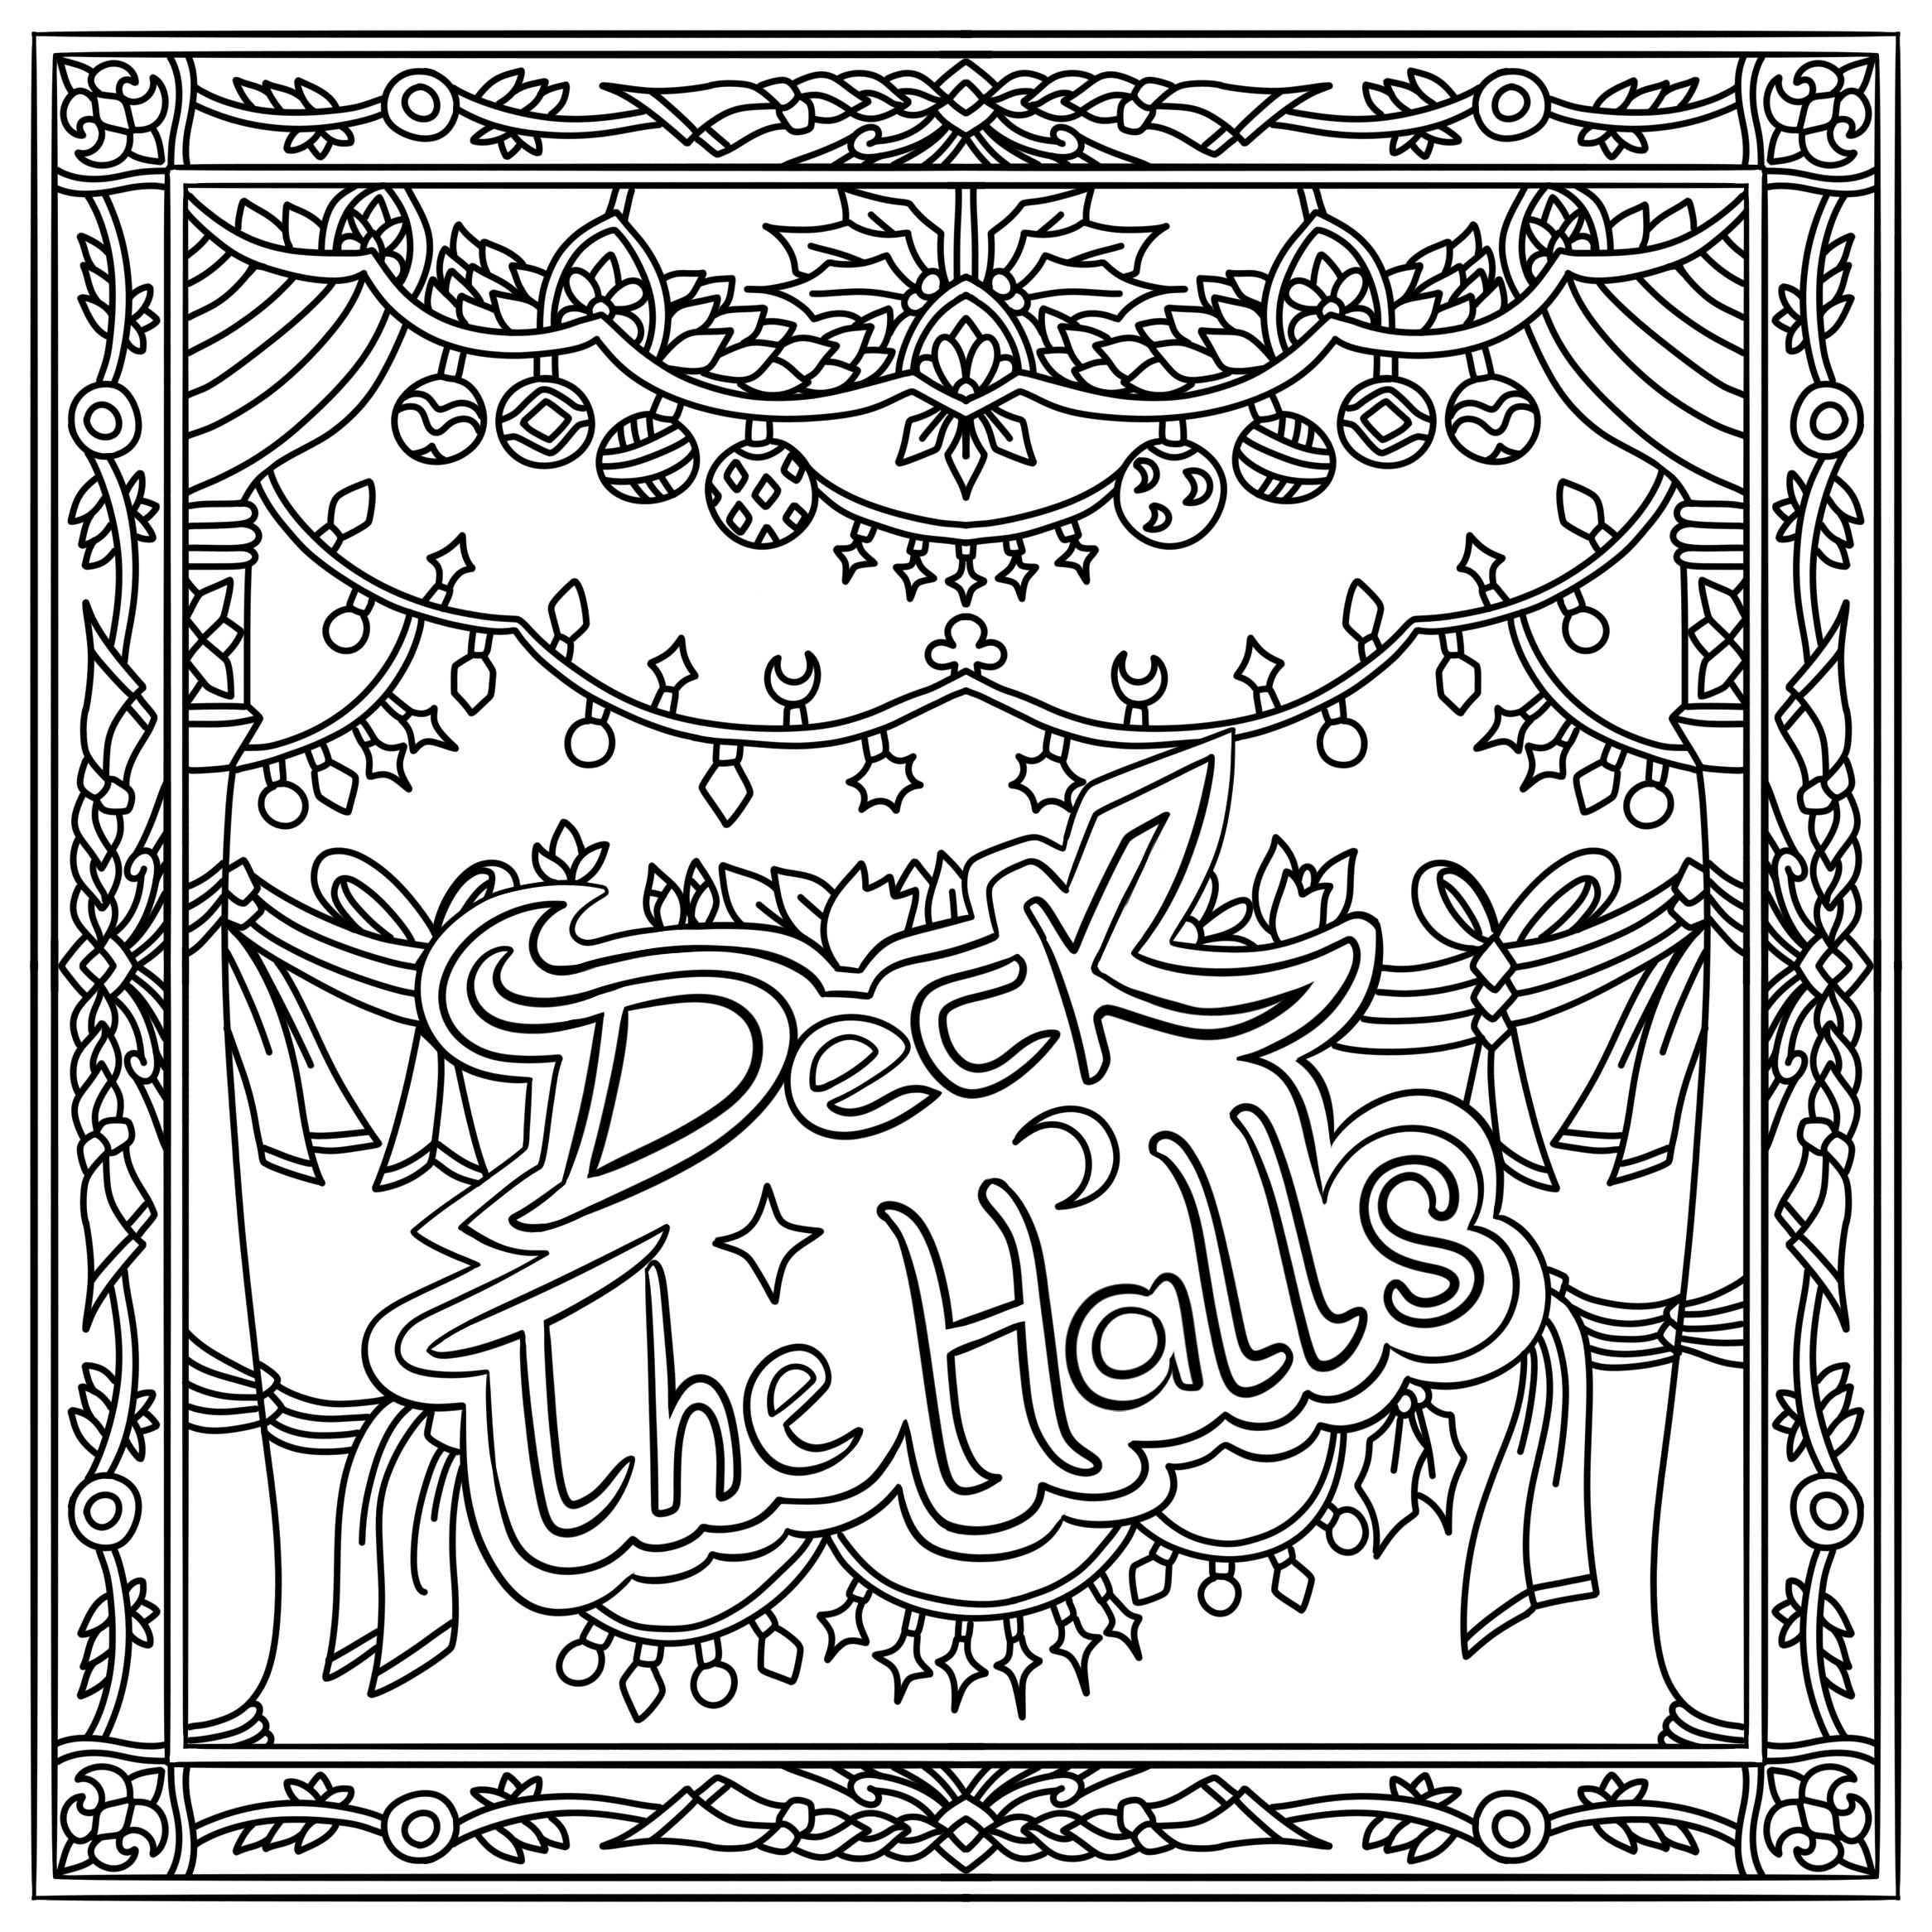 christmas mandalas say goodbye to stress by coloring christmas mandalas christmas mandalas